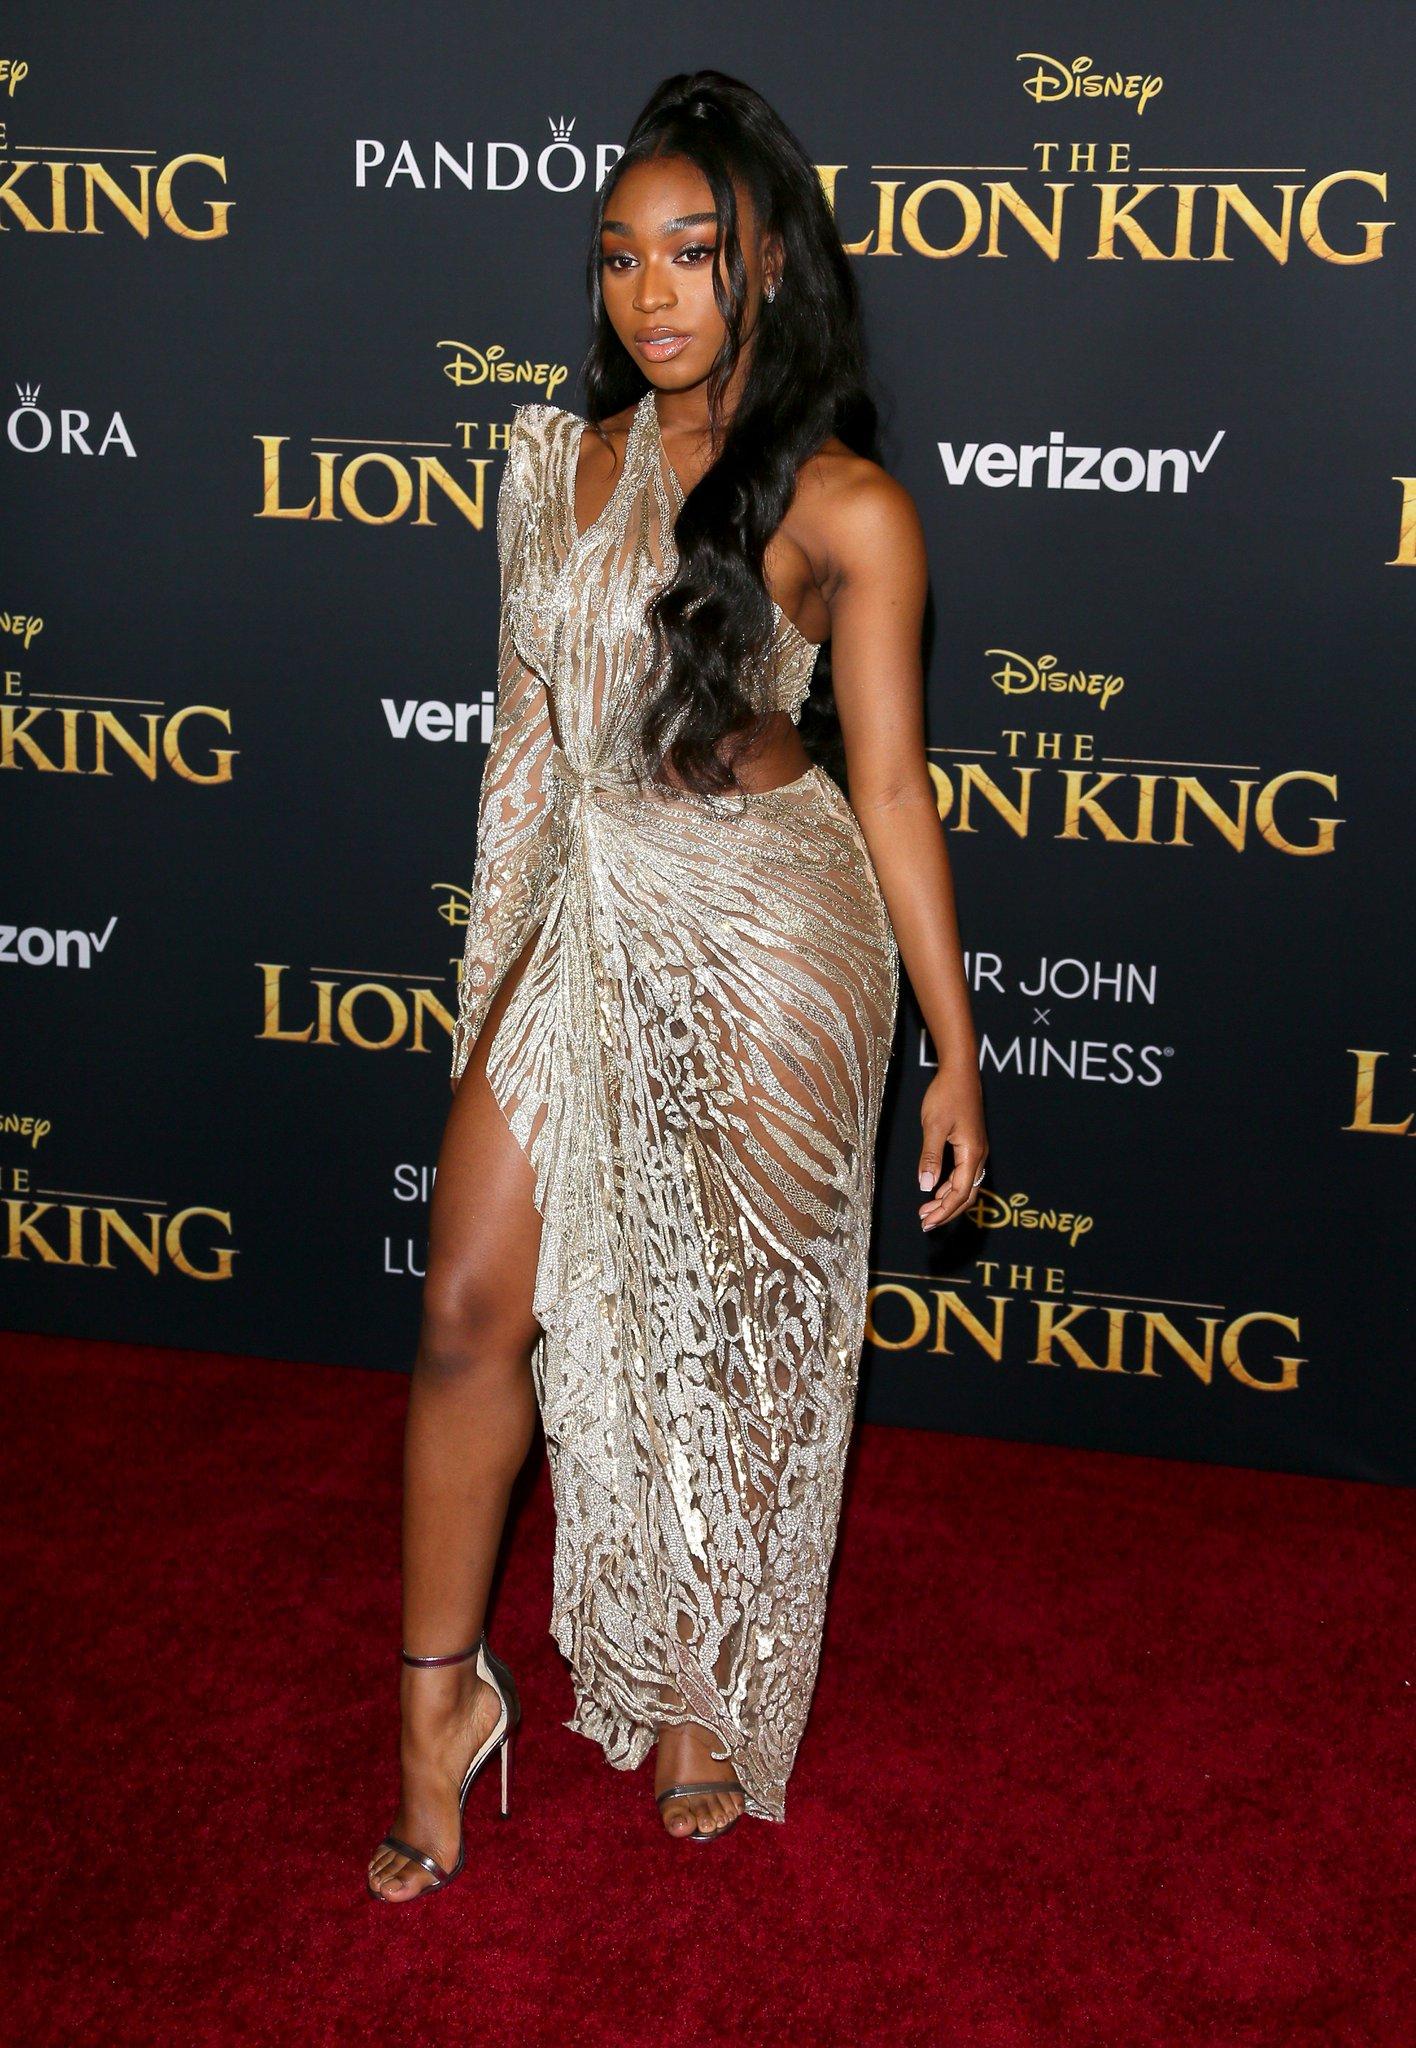 Image result for lion king premiere Normani